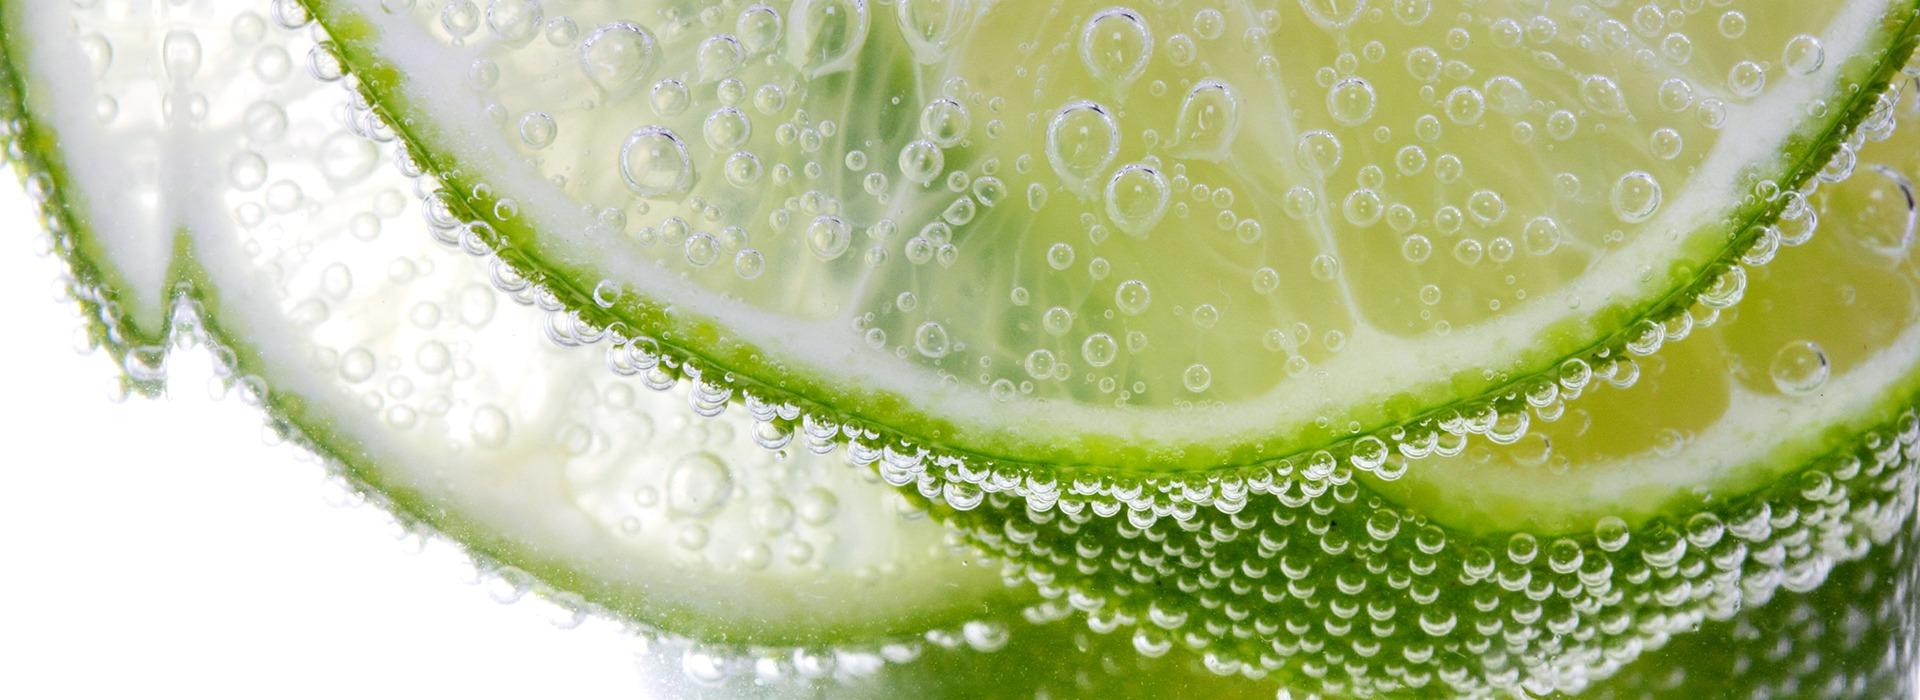 slide-limone-macro-verde